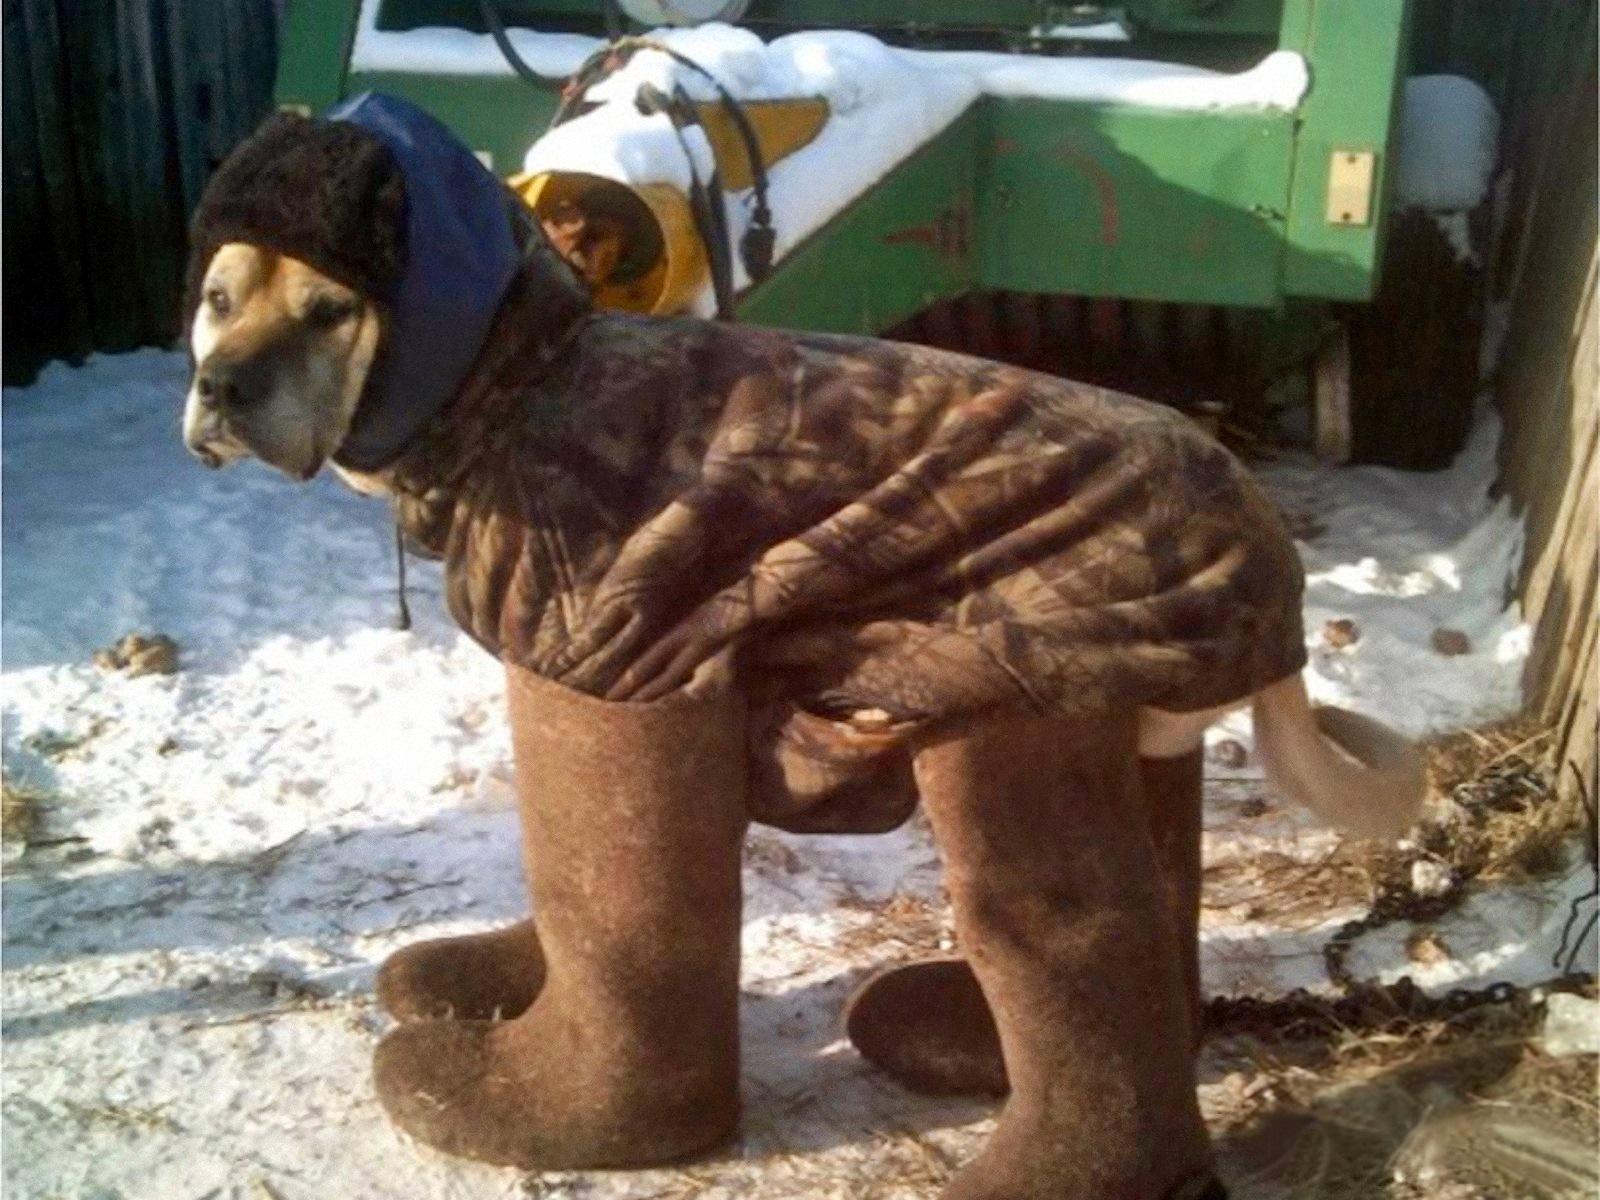 00 polish dog in winter 140116